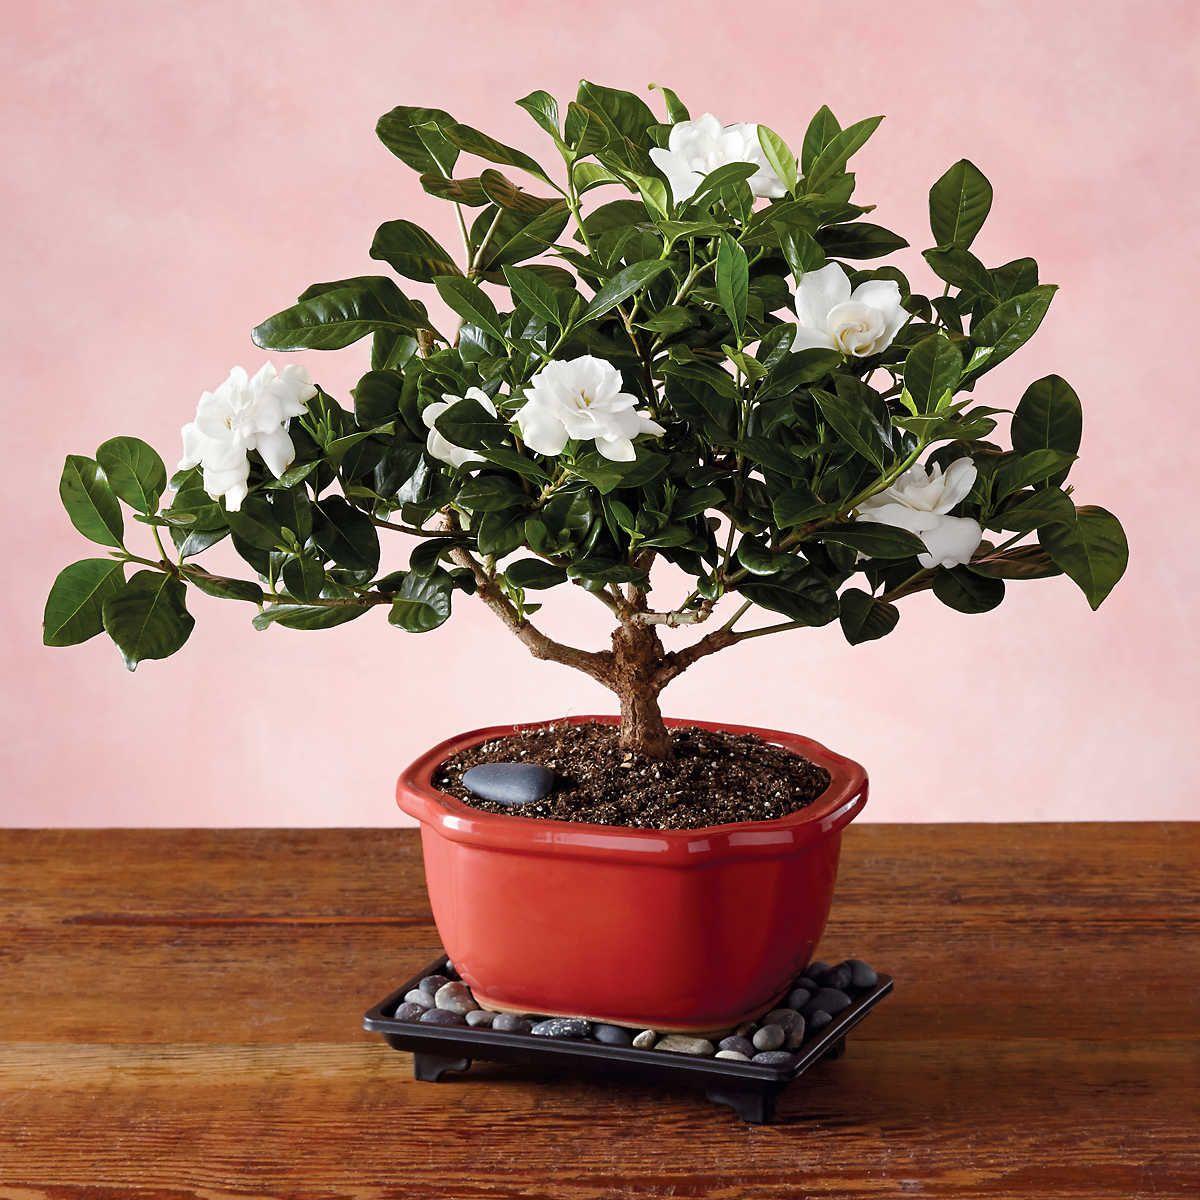 Order The Gardenia Bonsai Tree Gift One Of The Many Bonzai Tress